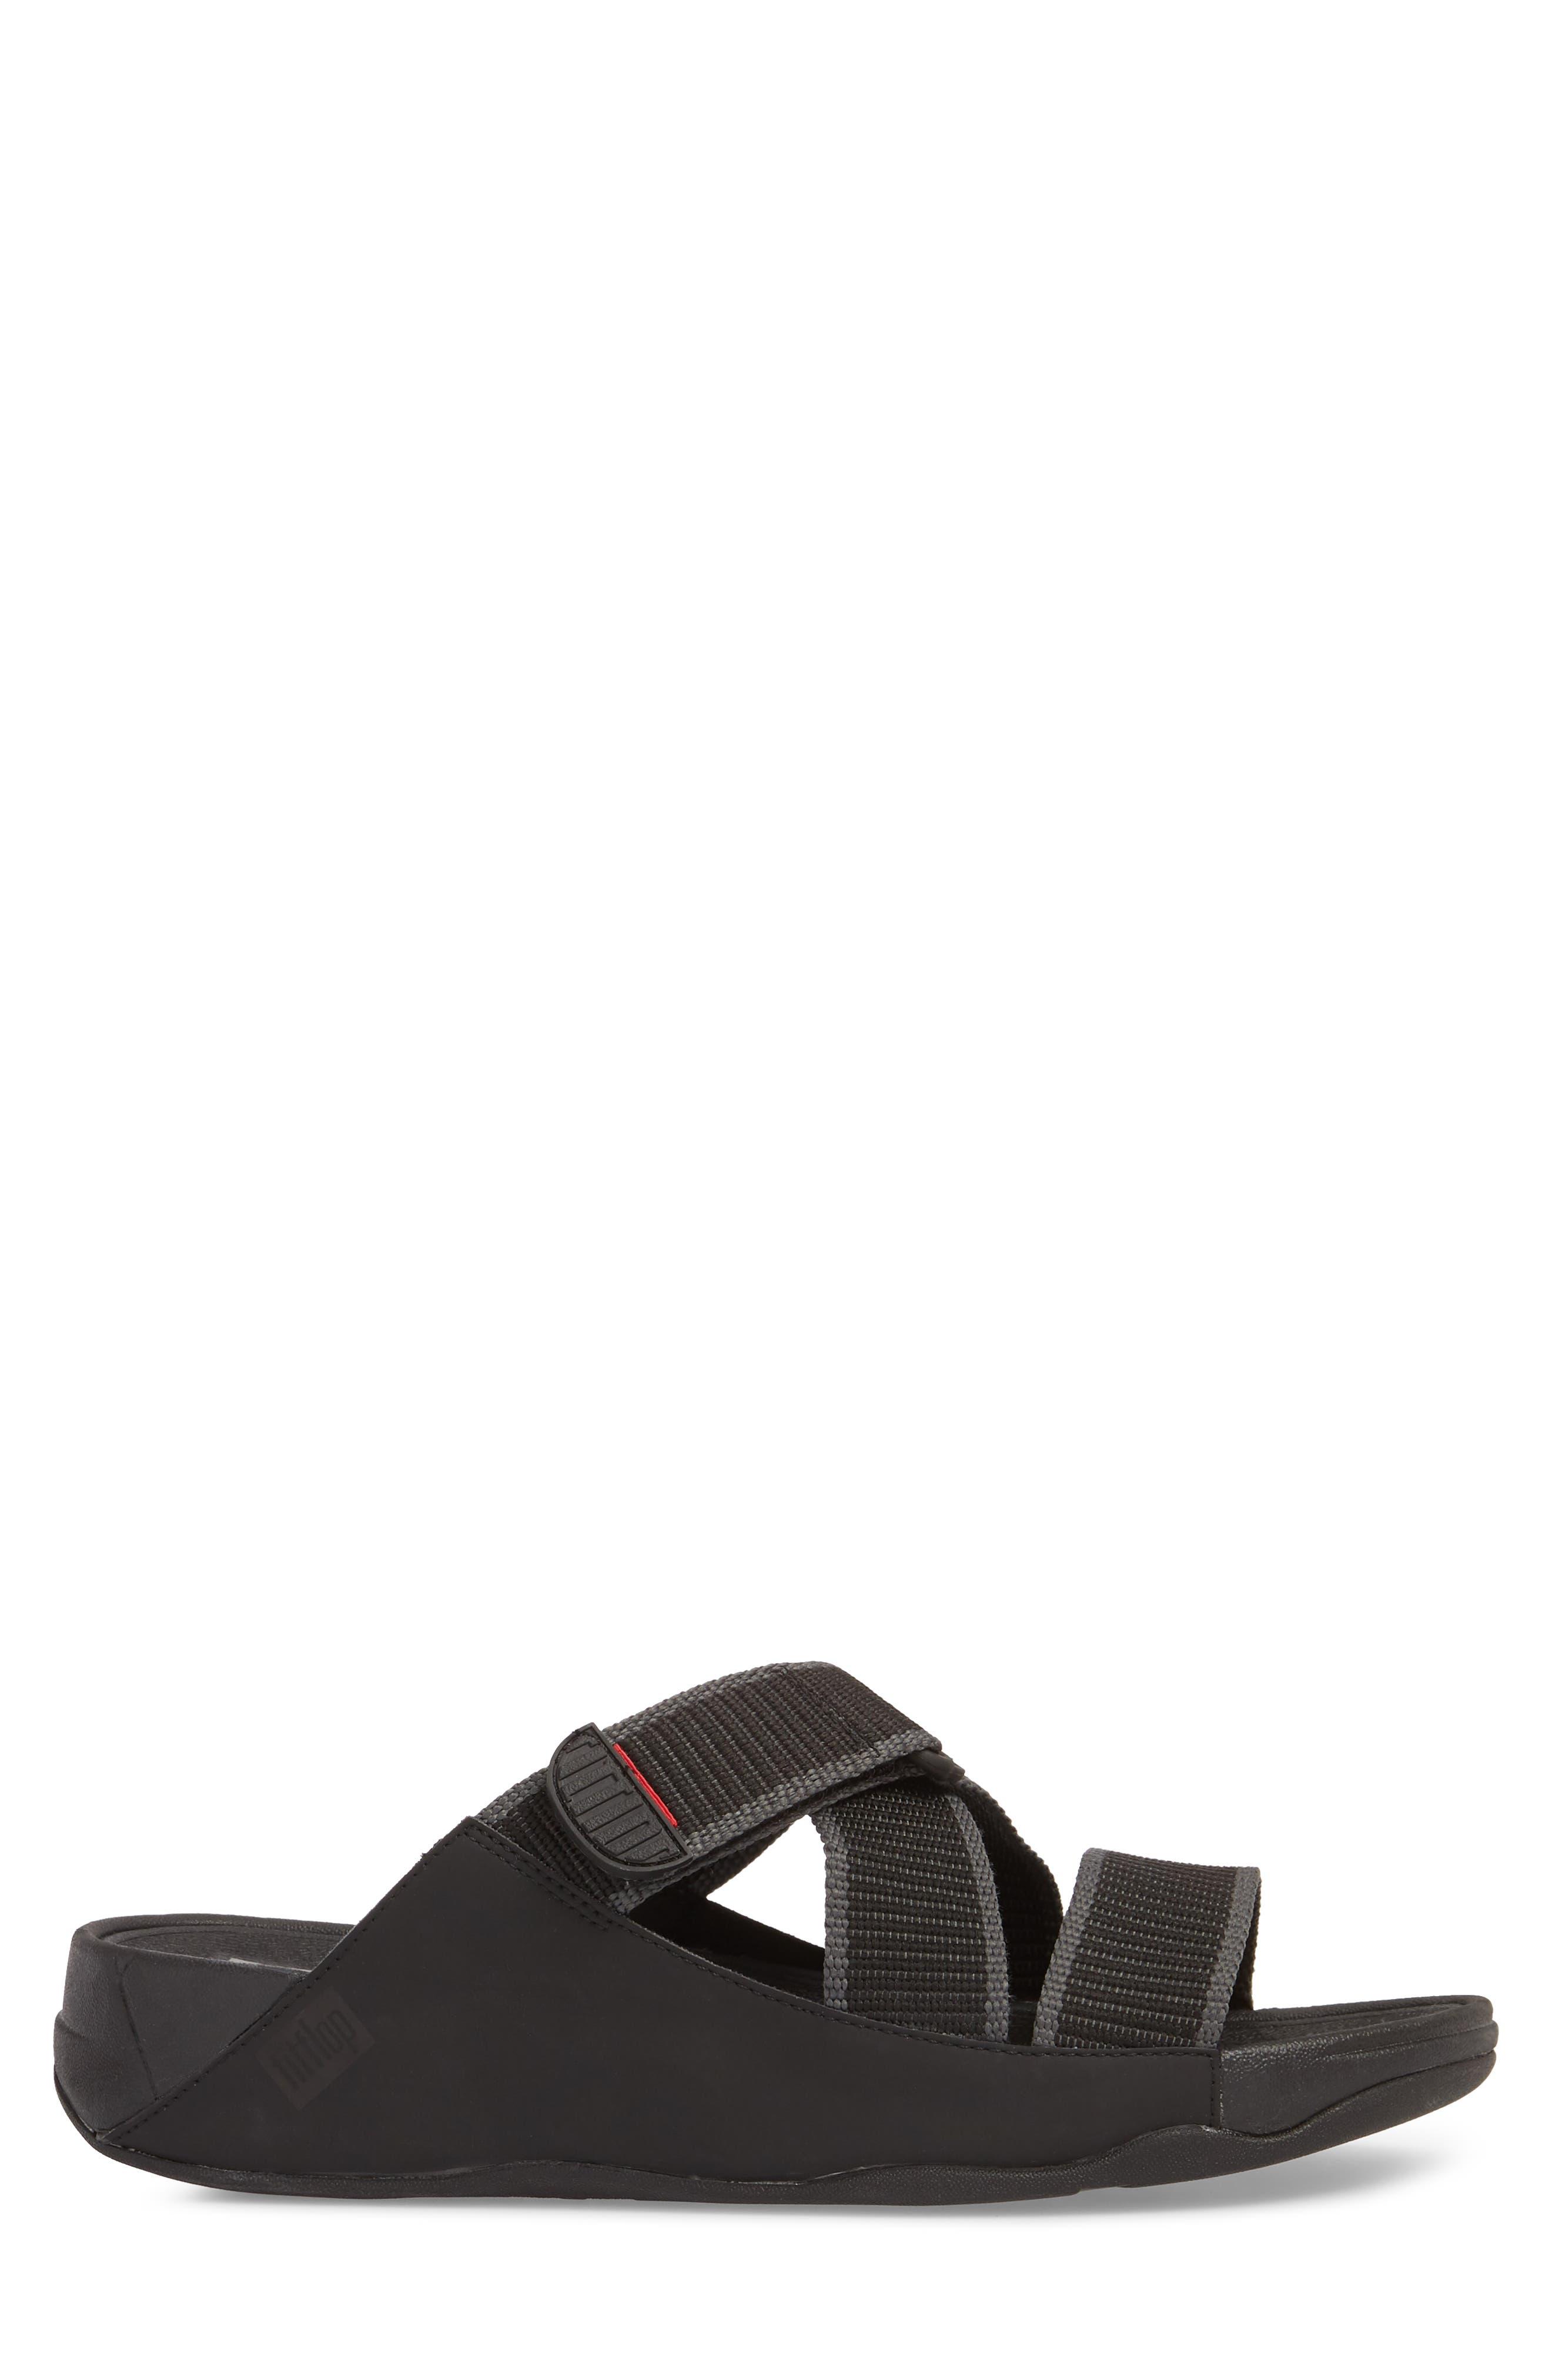 Sling II Slide Sandal,                             Alternate thumbnail 3, color,                             BLACK/ DARK SHADOW